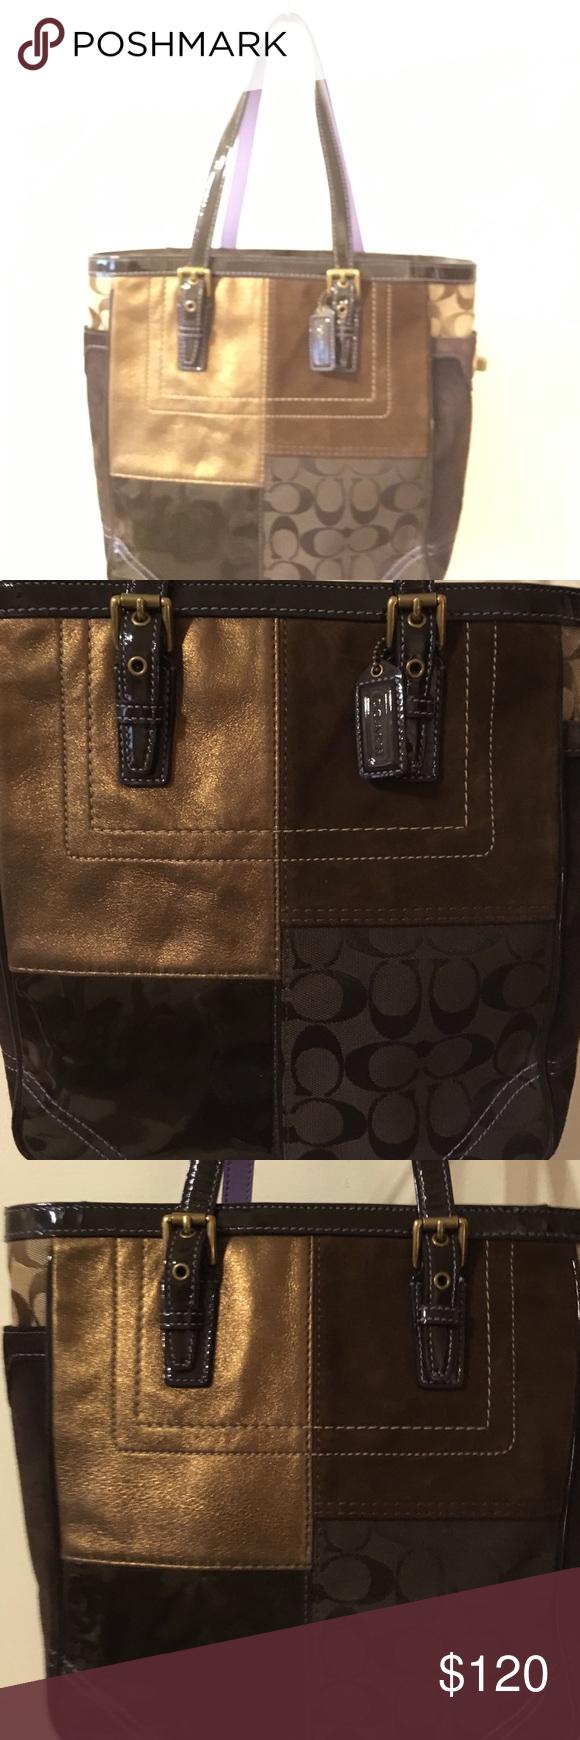 Authentic Coach Brown Patchwork Handbag Suede Leather Jacquard Tote F06j F10432 Rox 8 Drop Straps